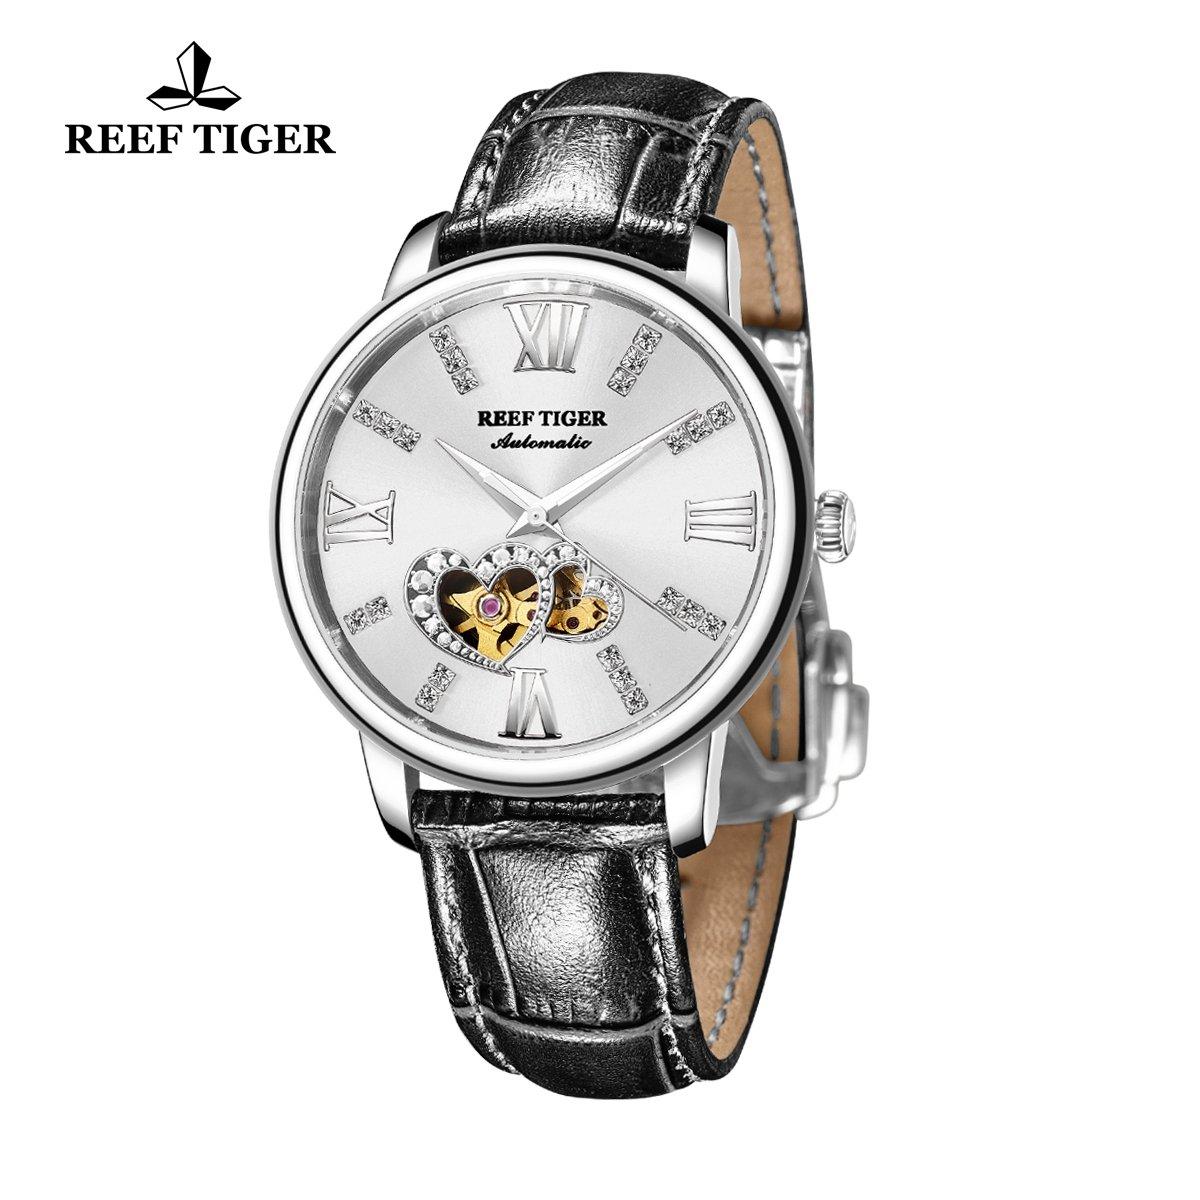 Đồng hồ Reef Tiger RGA1580-YWB